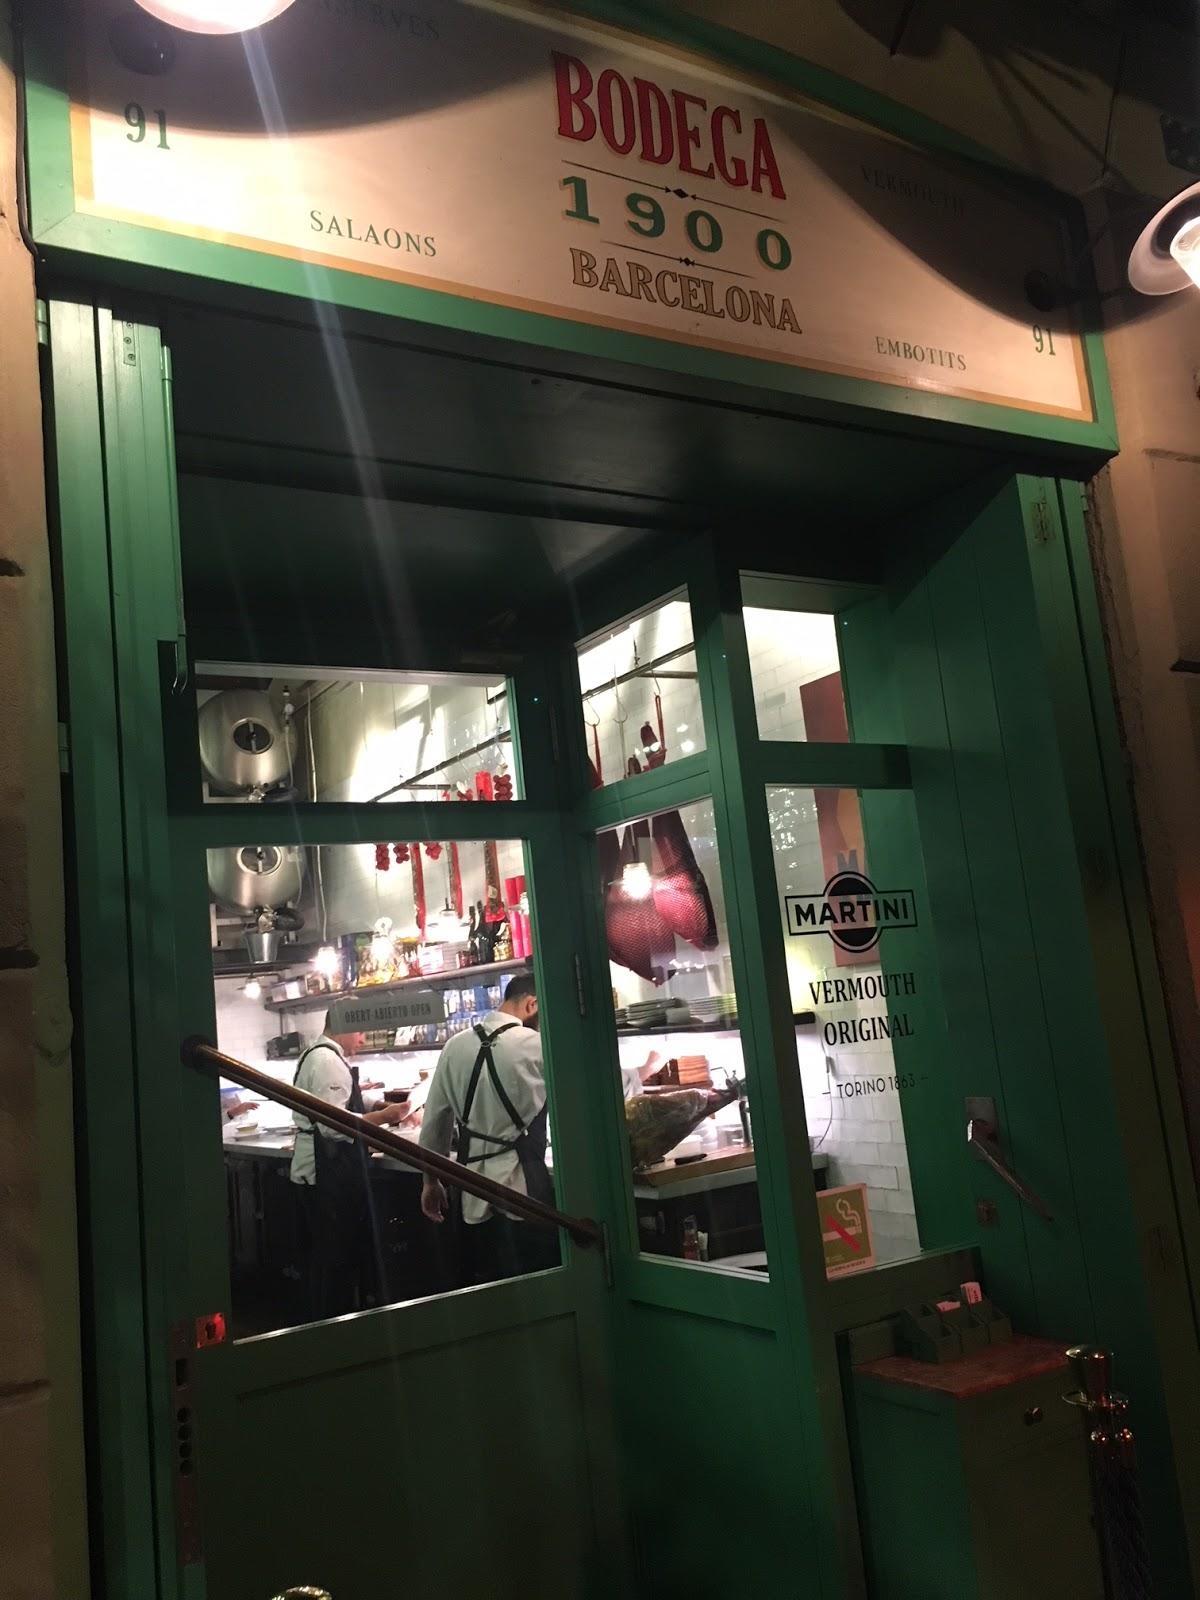 The Food Seeker Bodega 1900 L Eixample Barcelona Spain  # Muebles Duk Oiartzun